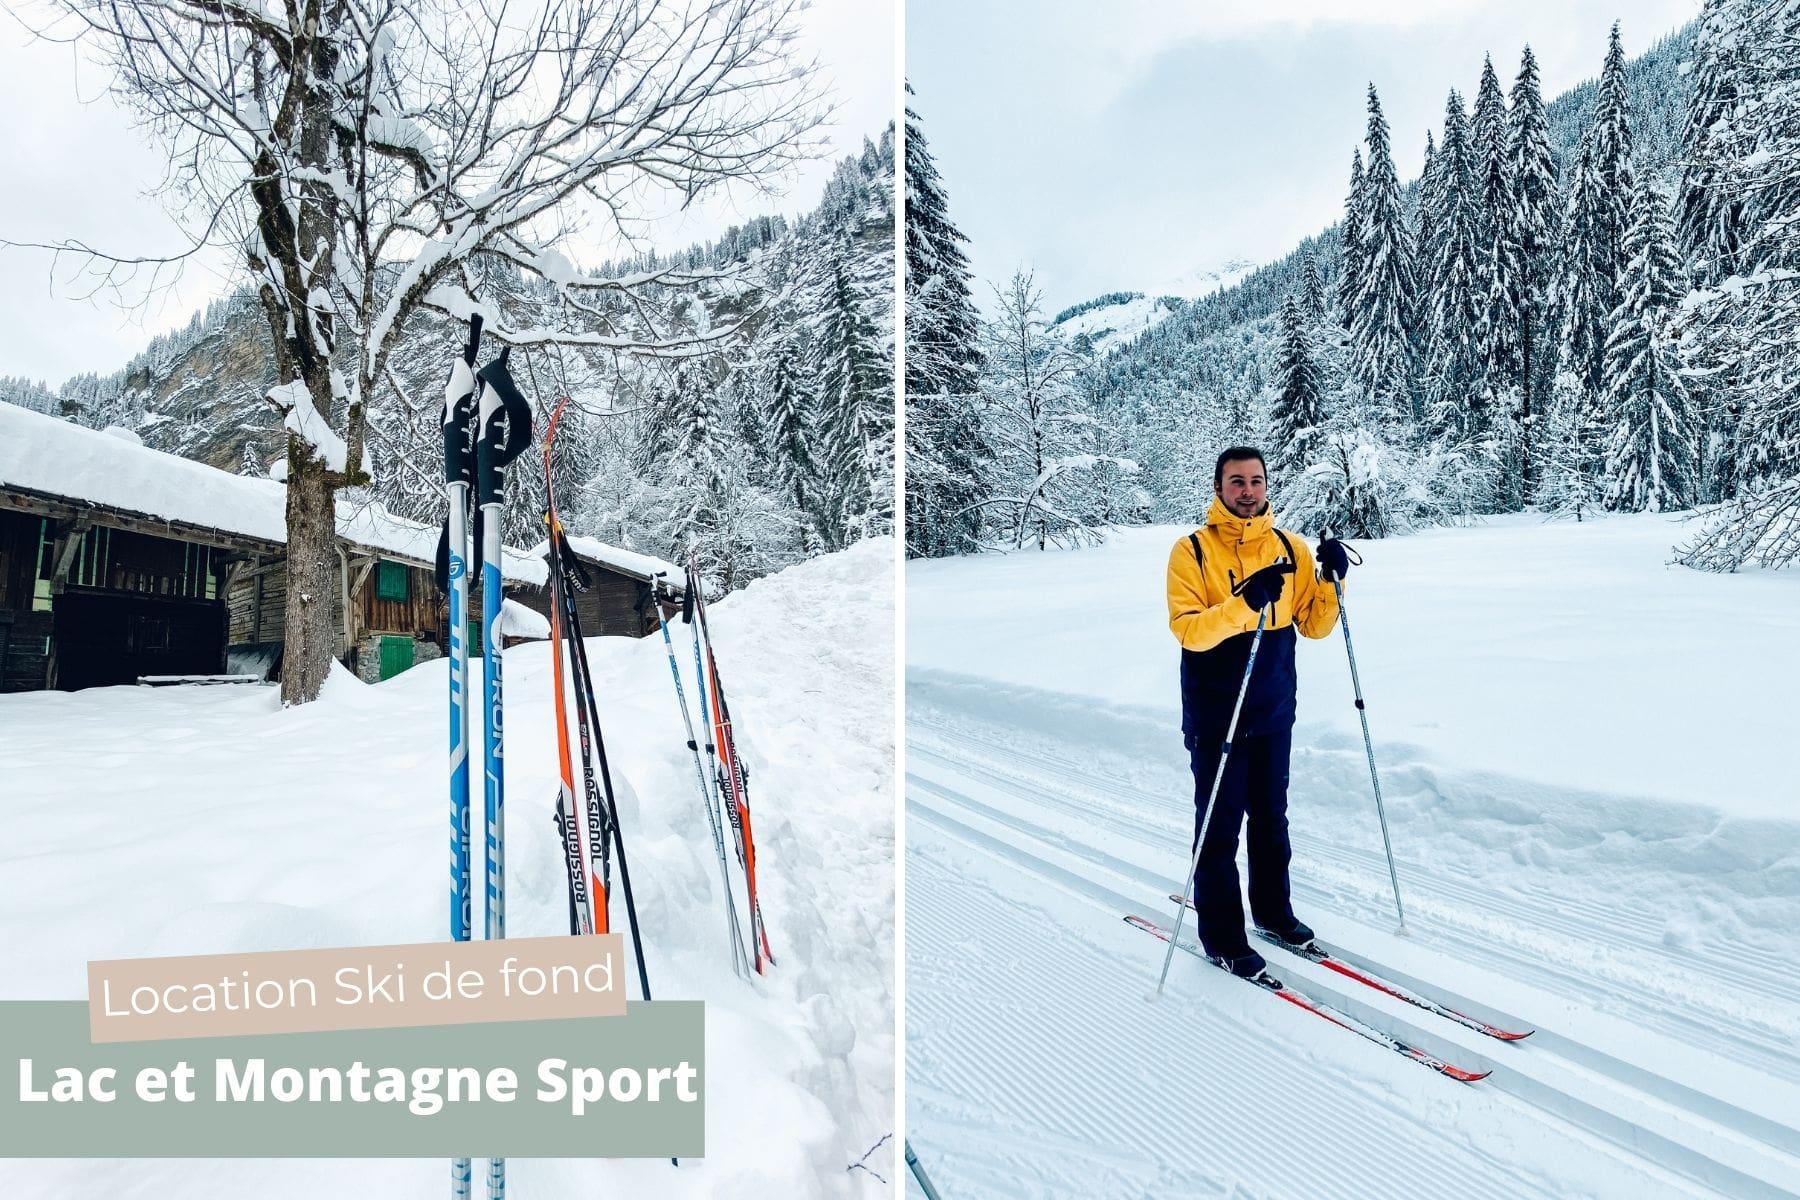 activite ski de fond